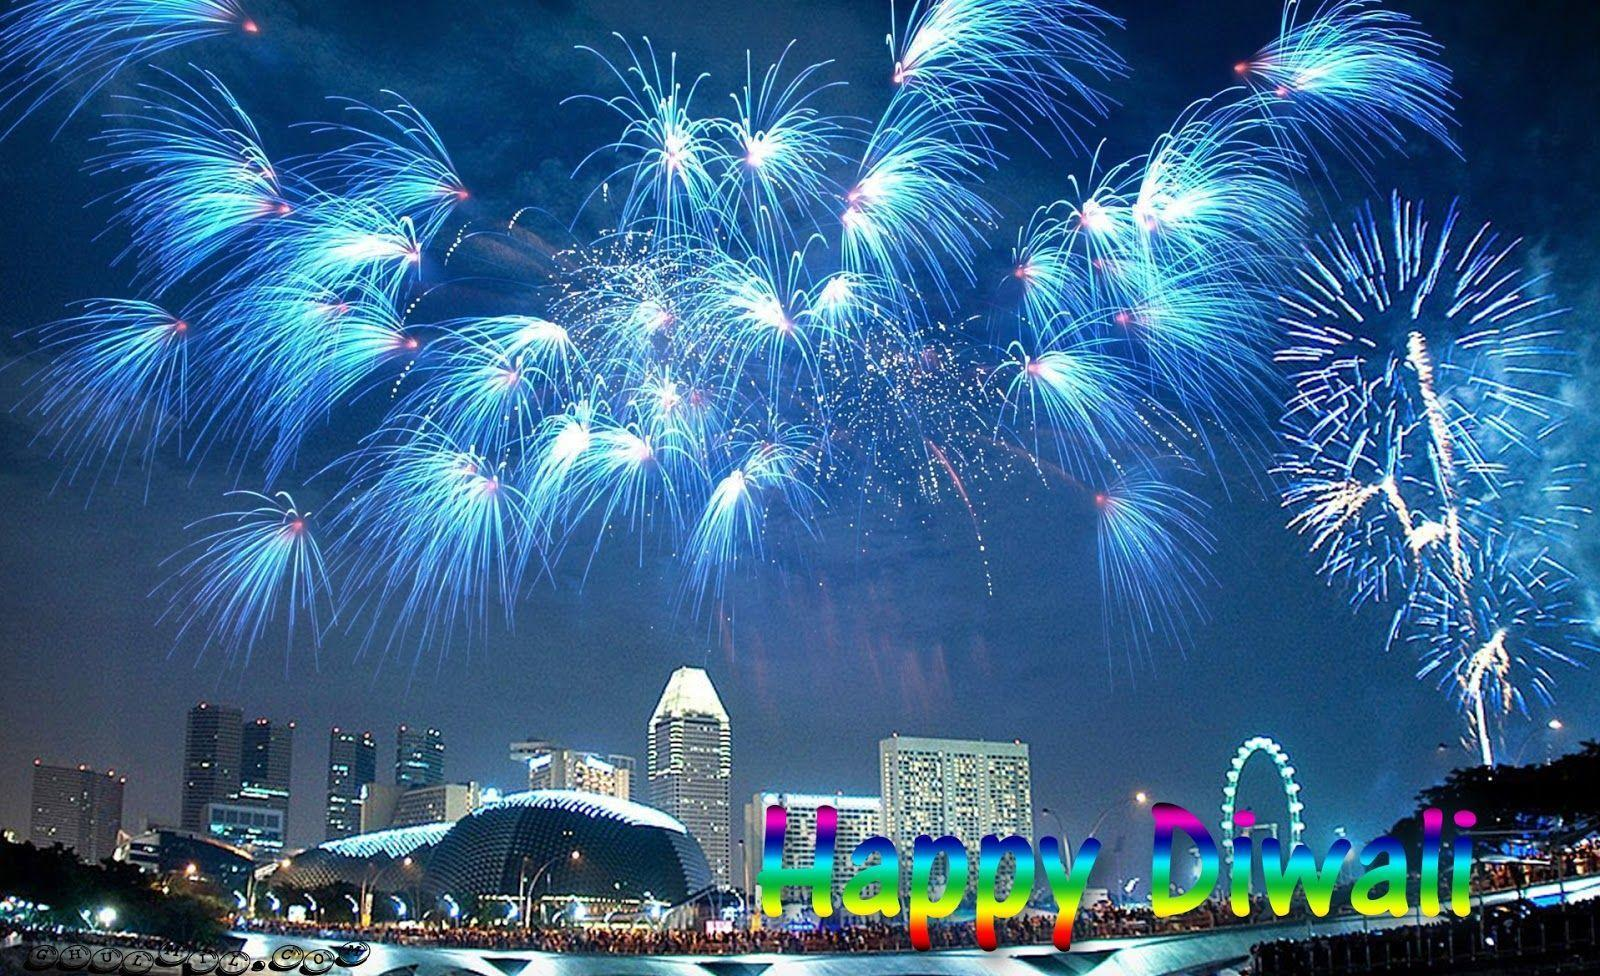 Diwali Wallpaper for PC, Mobile, Desktop Background Download Free ...